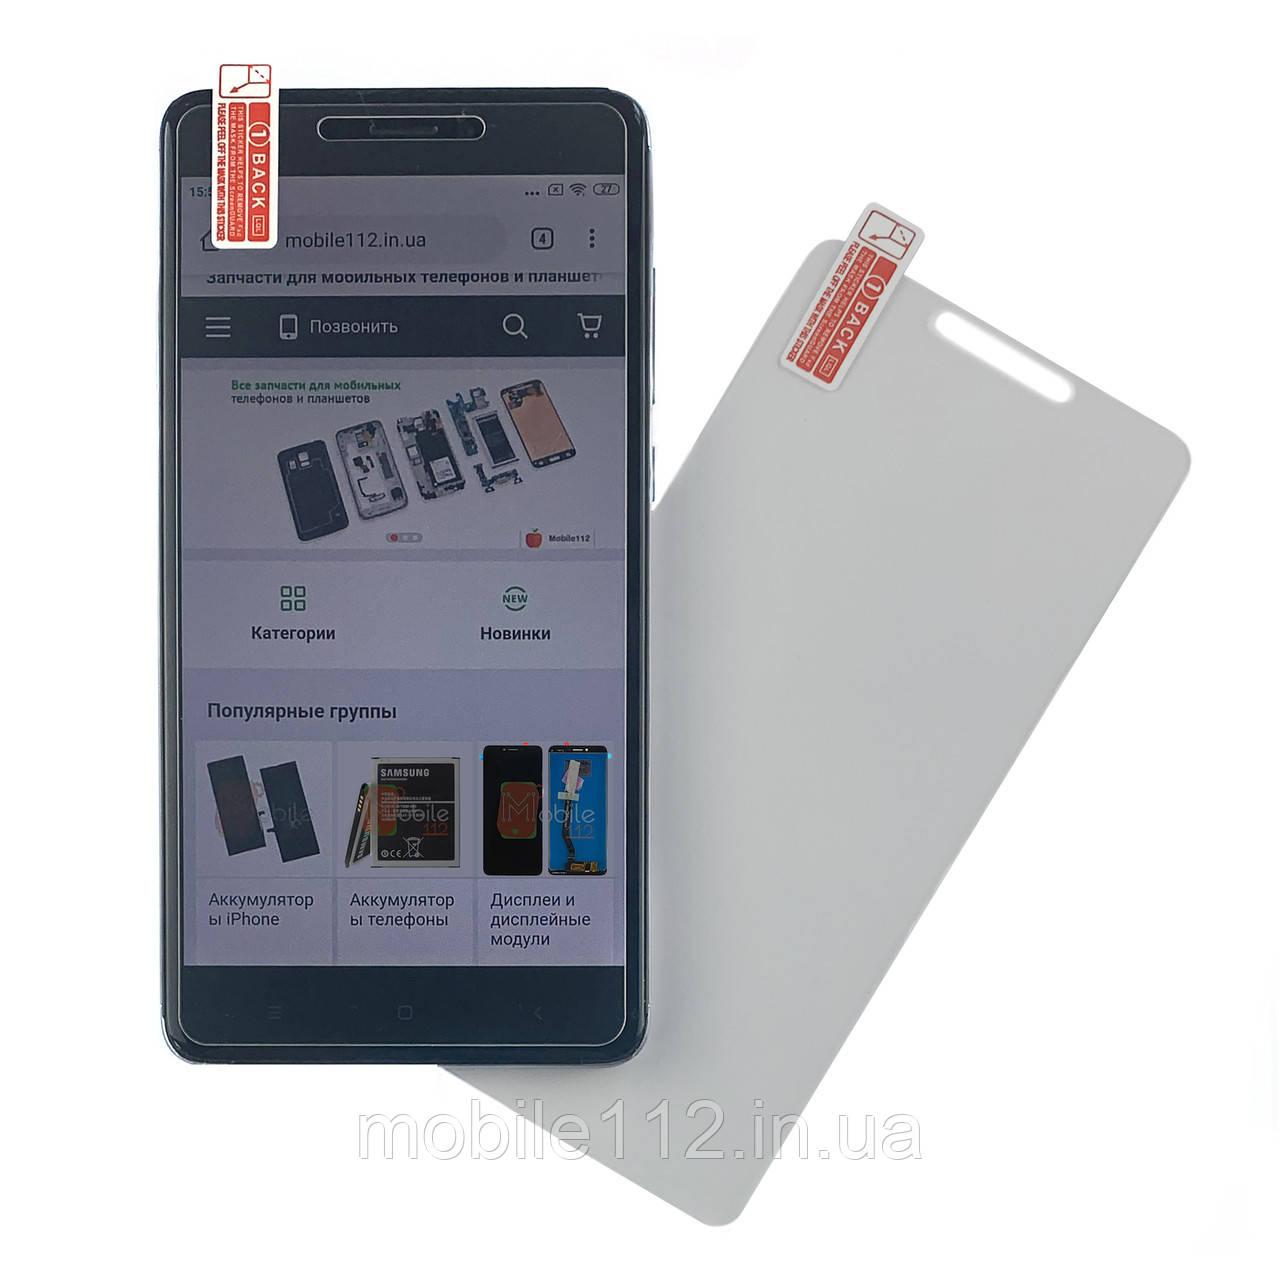 Защитное стекло Samsung Galaxy Star Advance G350 G350E прозрачное 2D 9H